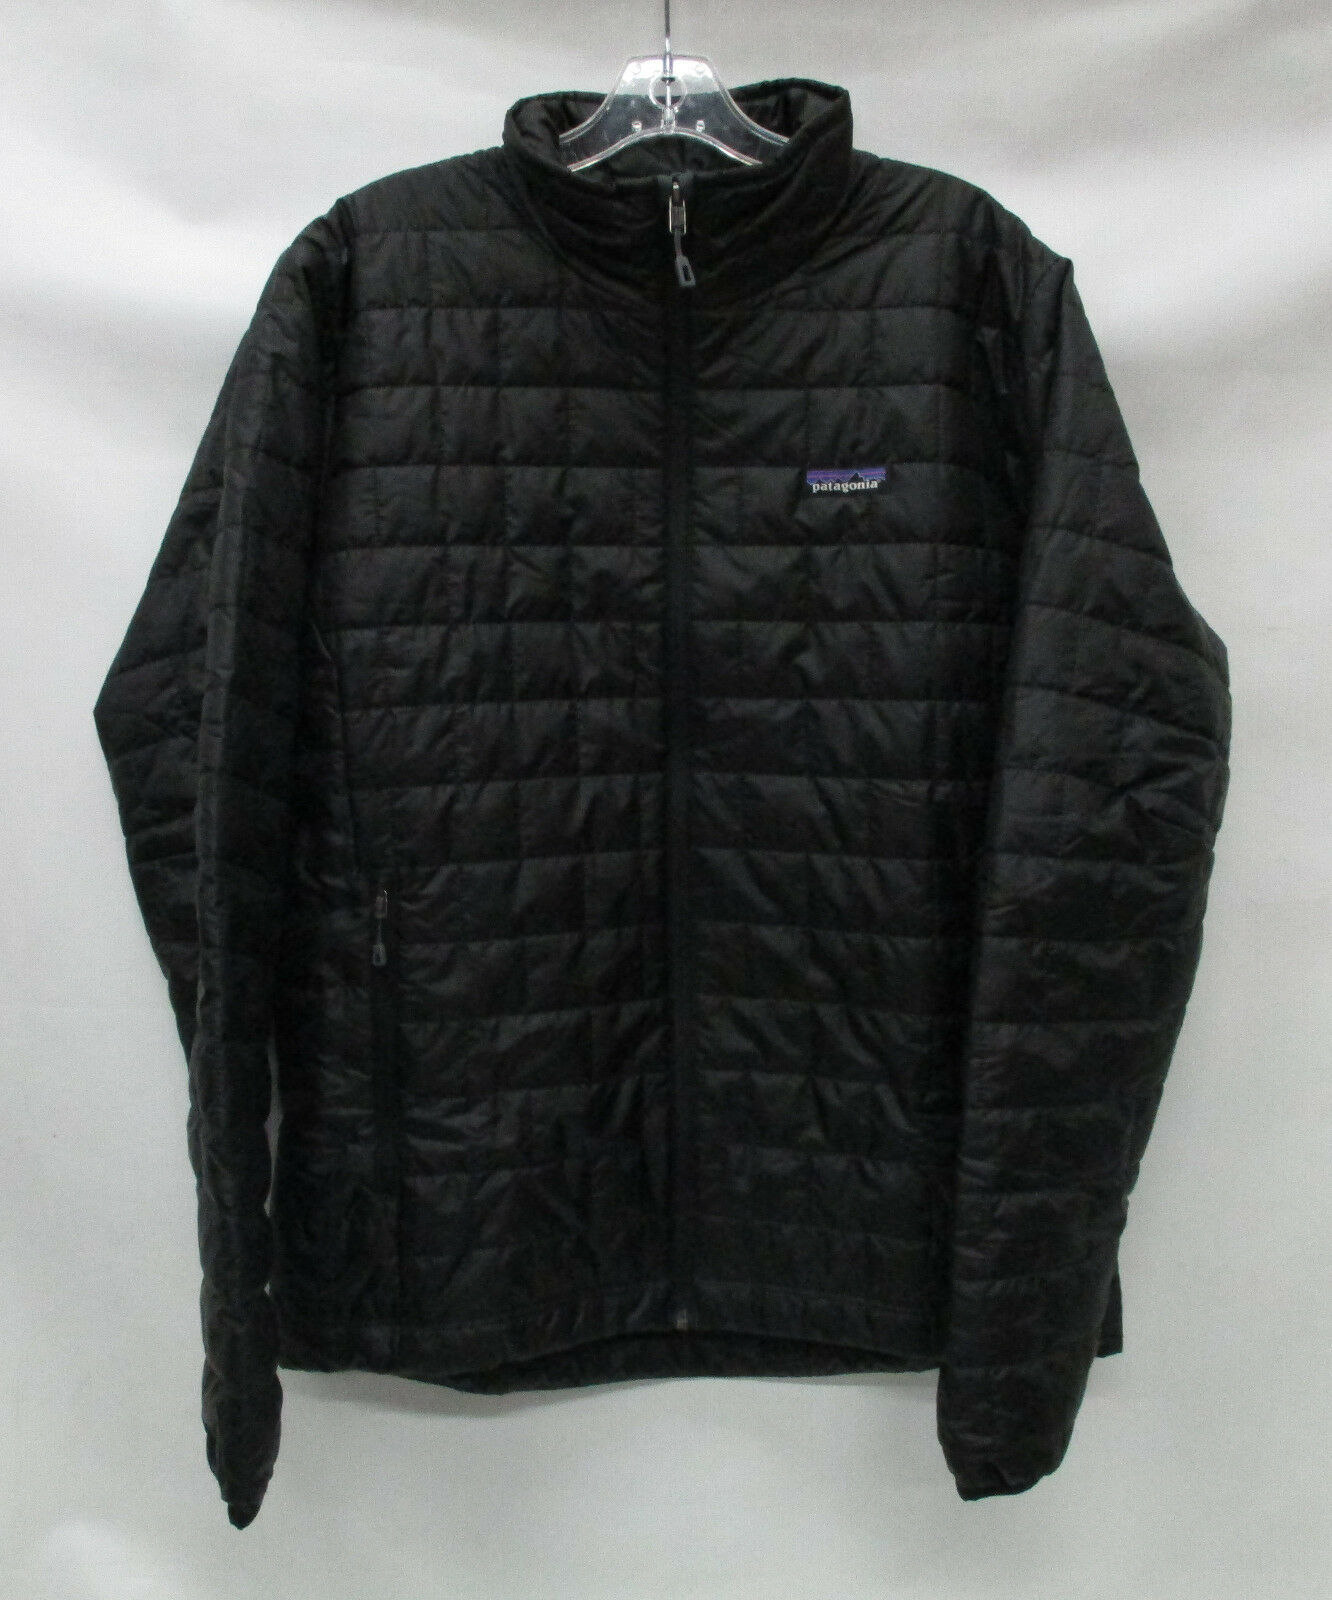 Patagonia Hommes Nano Puff Jacket 84212 Noir Taille 2XL